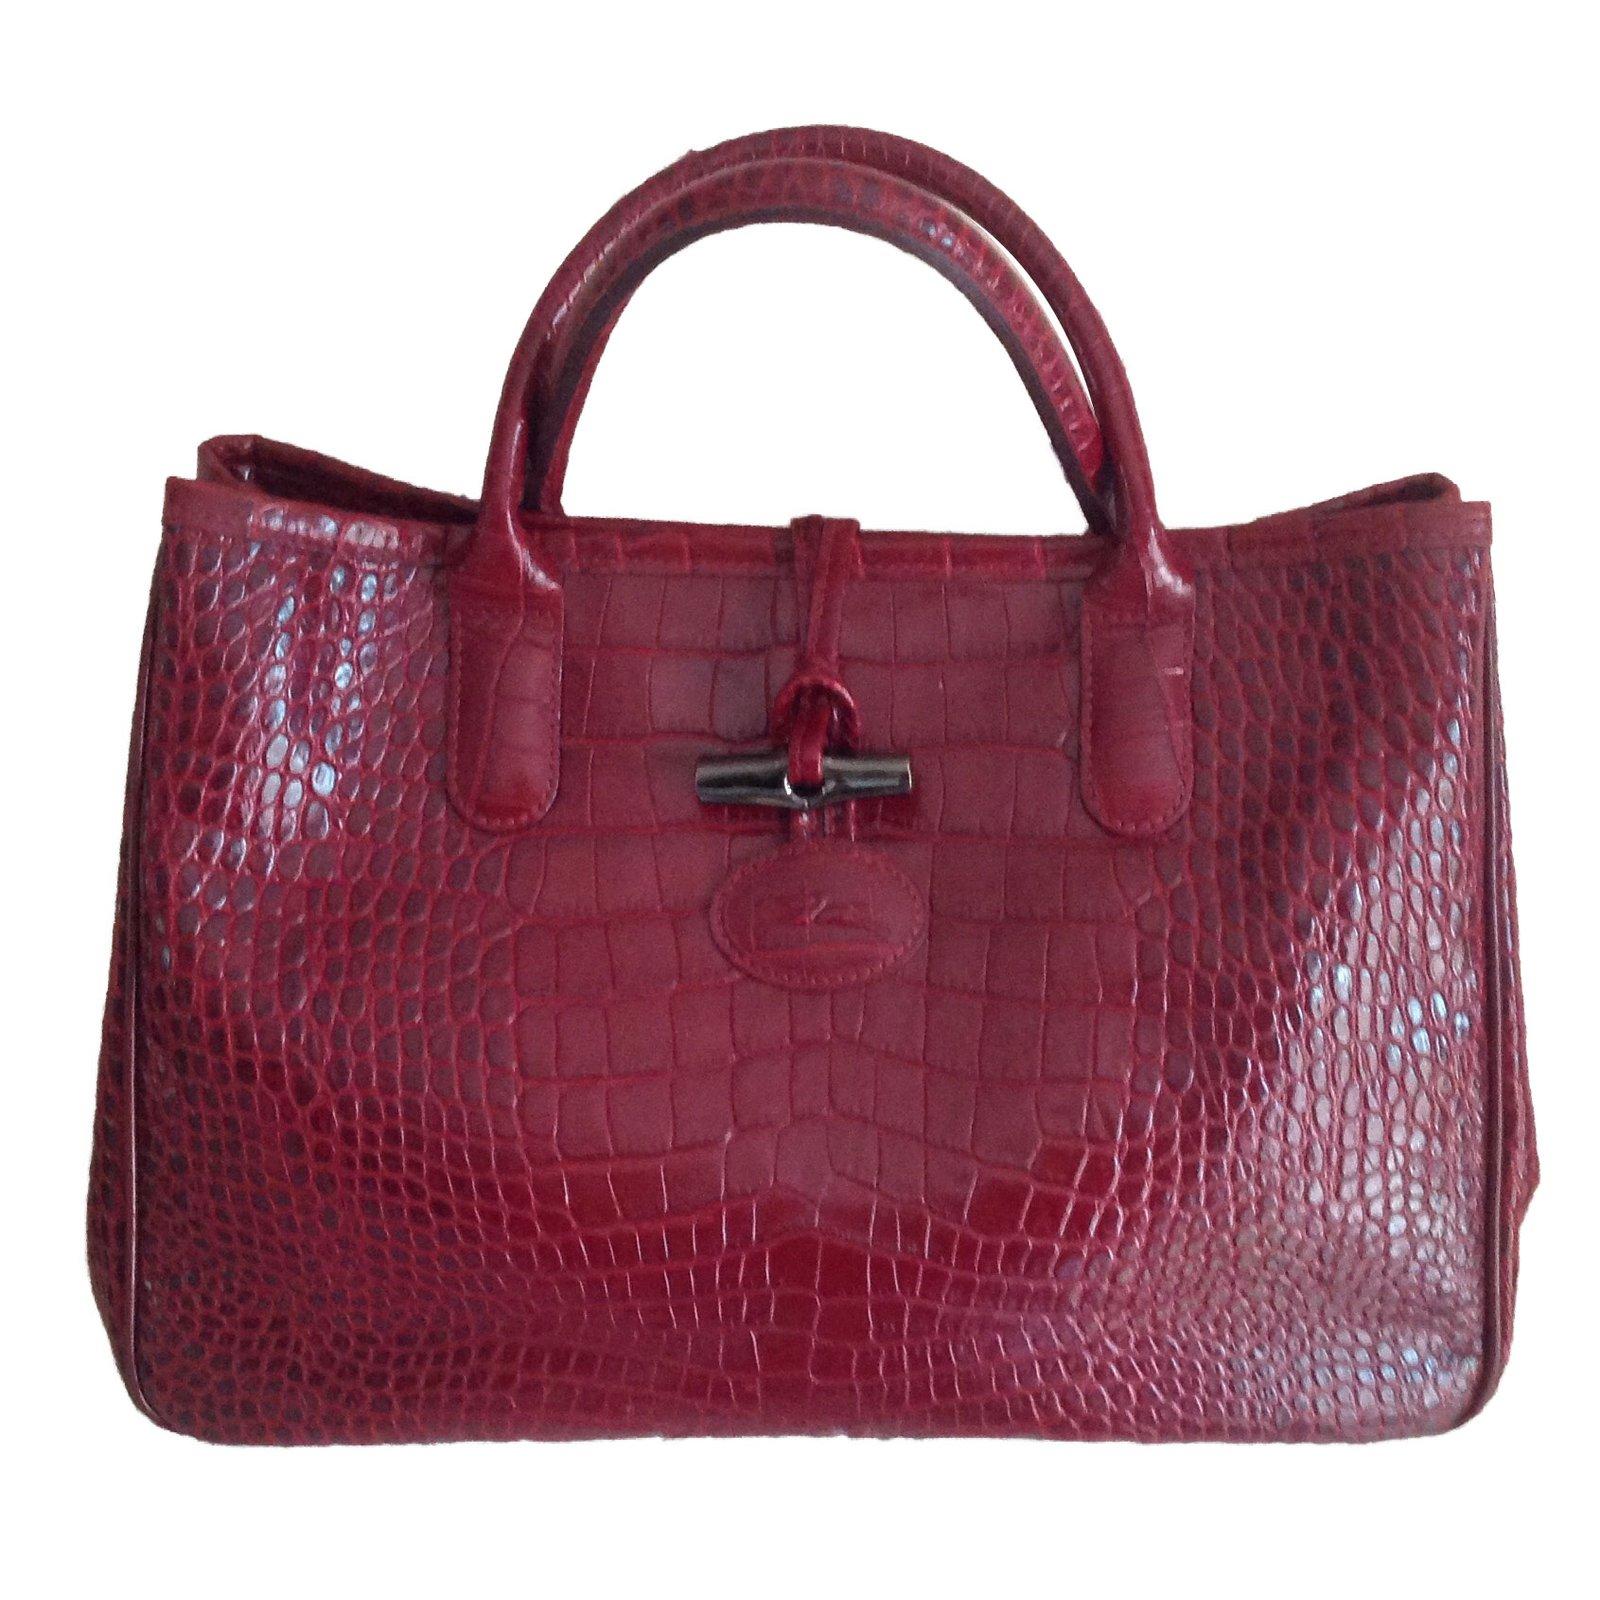 Longchamp Roseau Bag Handbags Leather Dark Red Ref 42722 Joli Closet